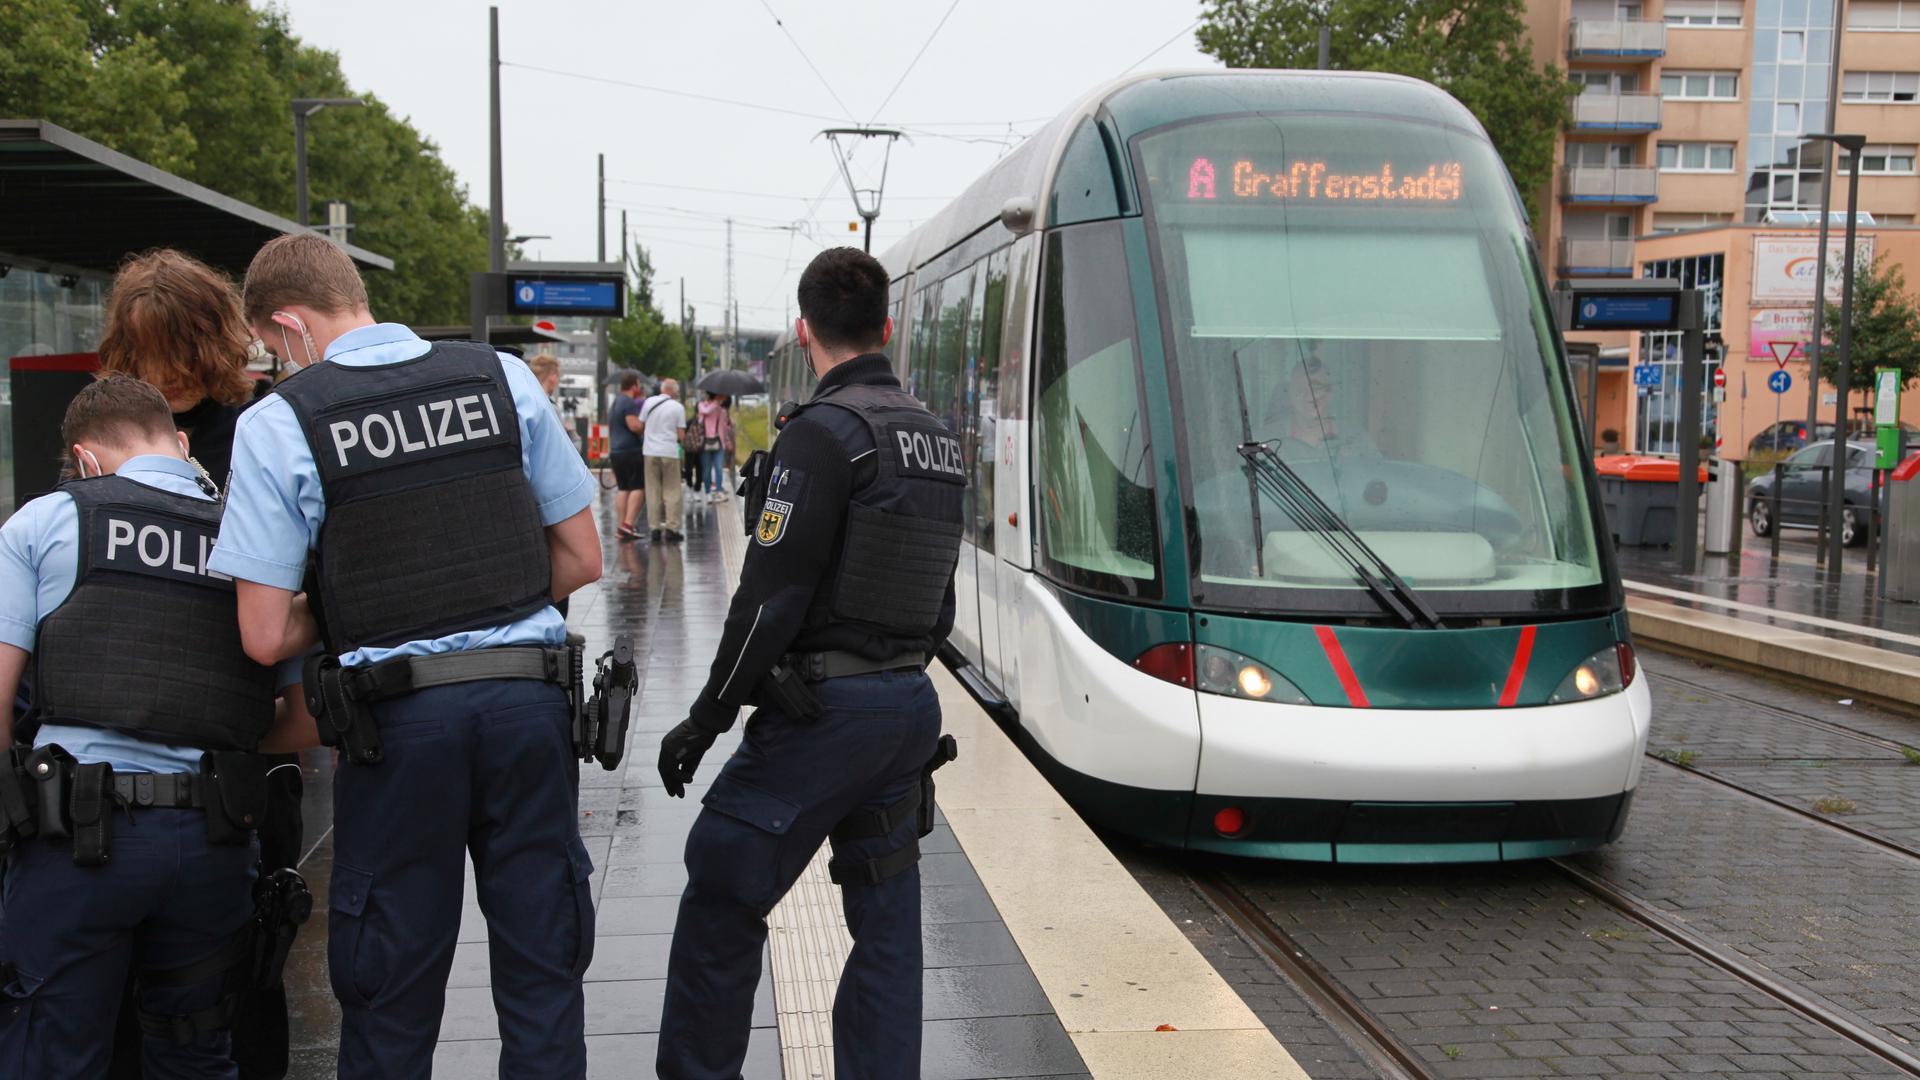 Bundespolizisten bei Kontrolle an Kehler Trambahnhaltestelle Bahnhof